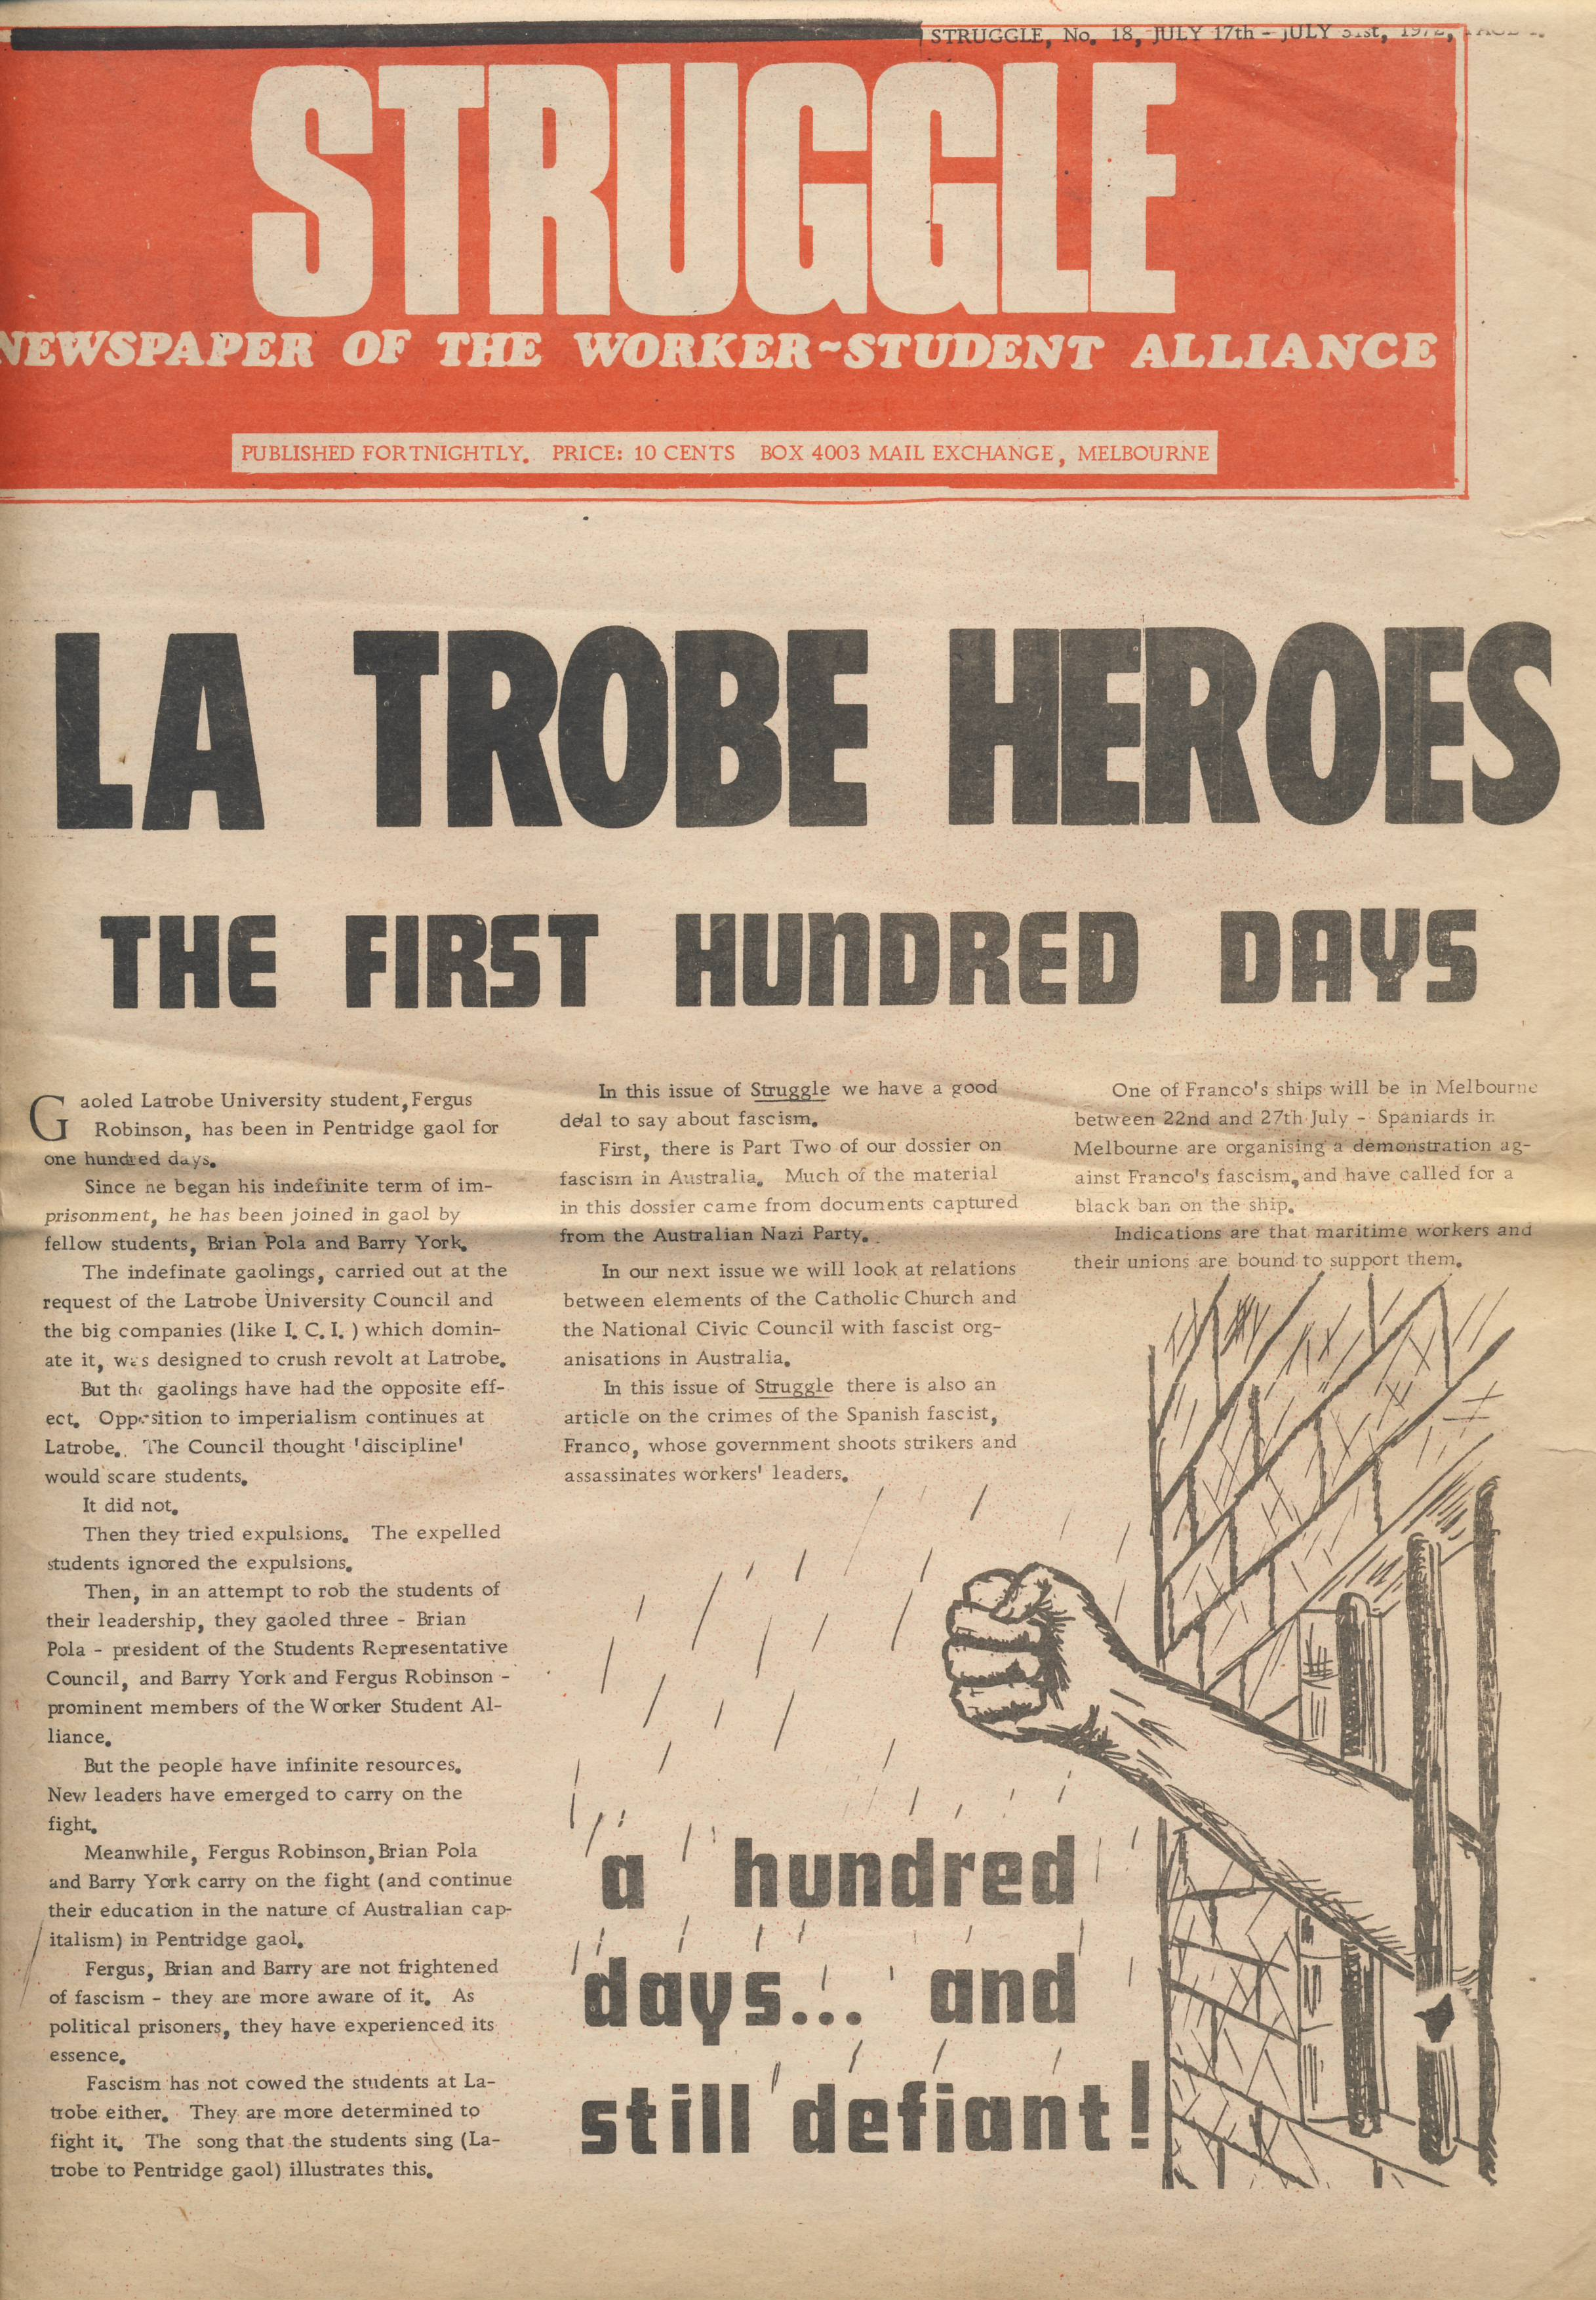 Struggle - La Trobe heroes cover 1972